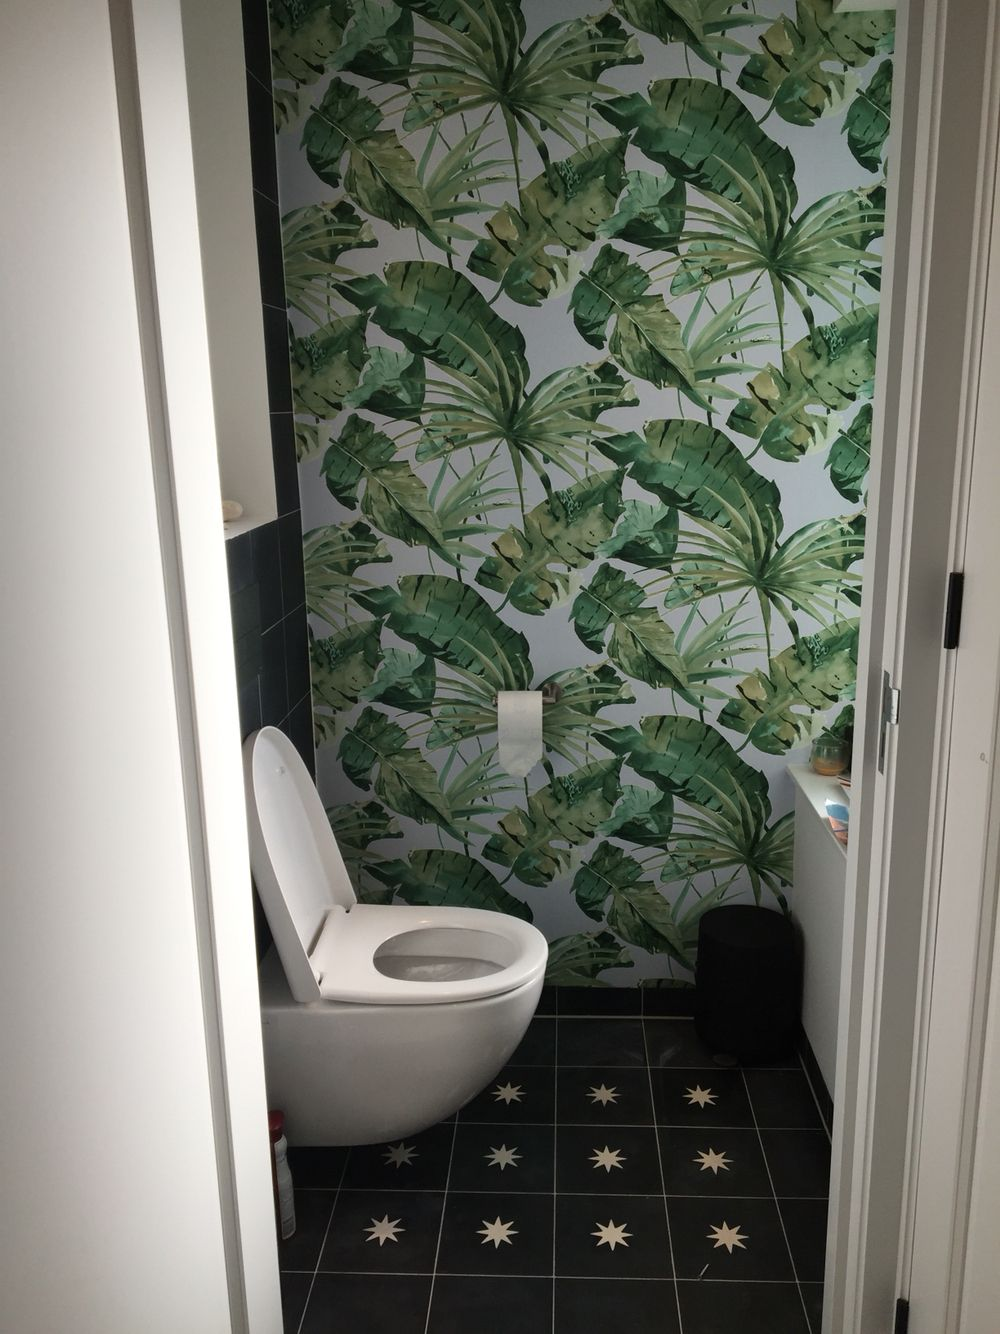 Tegels behang bathroom toilet - Toilet | Pinterest - Tegels ...